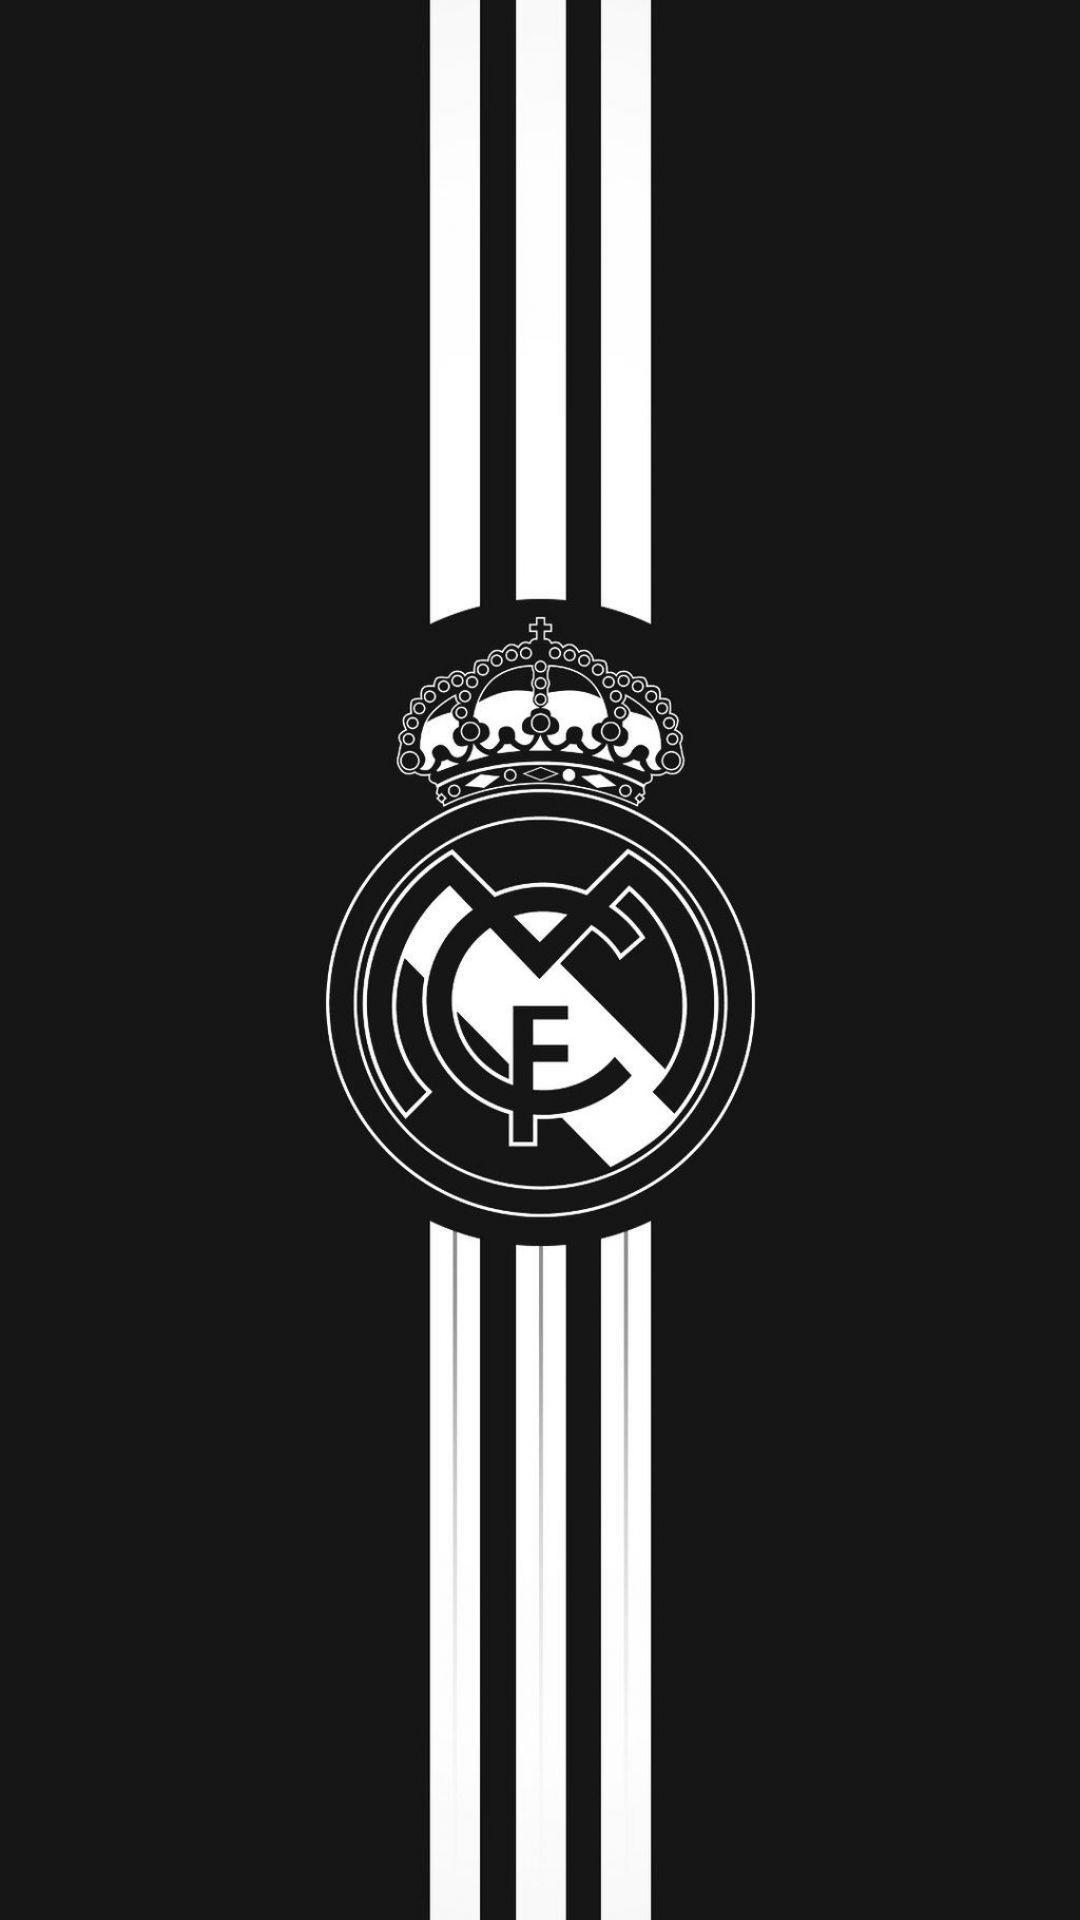 8240 Travel World Images Hd Photos 1080p Wallpapers Android Iphone 2020 Real Madrid Wallpapers Real Madrid Football Ronaldo Real Madrid